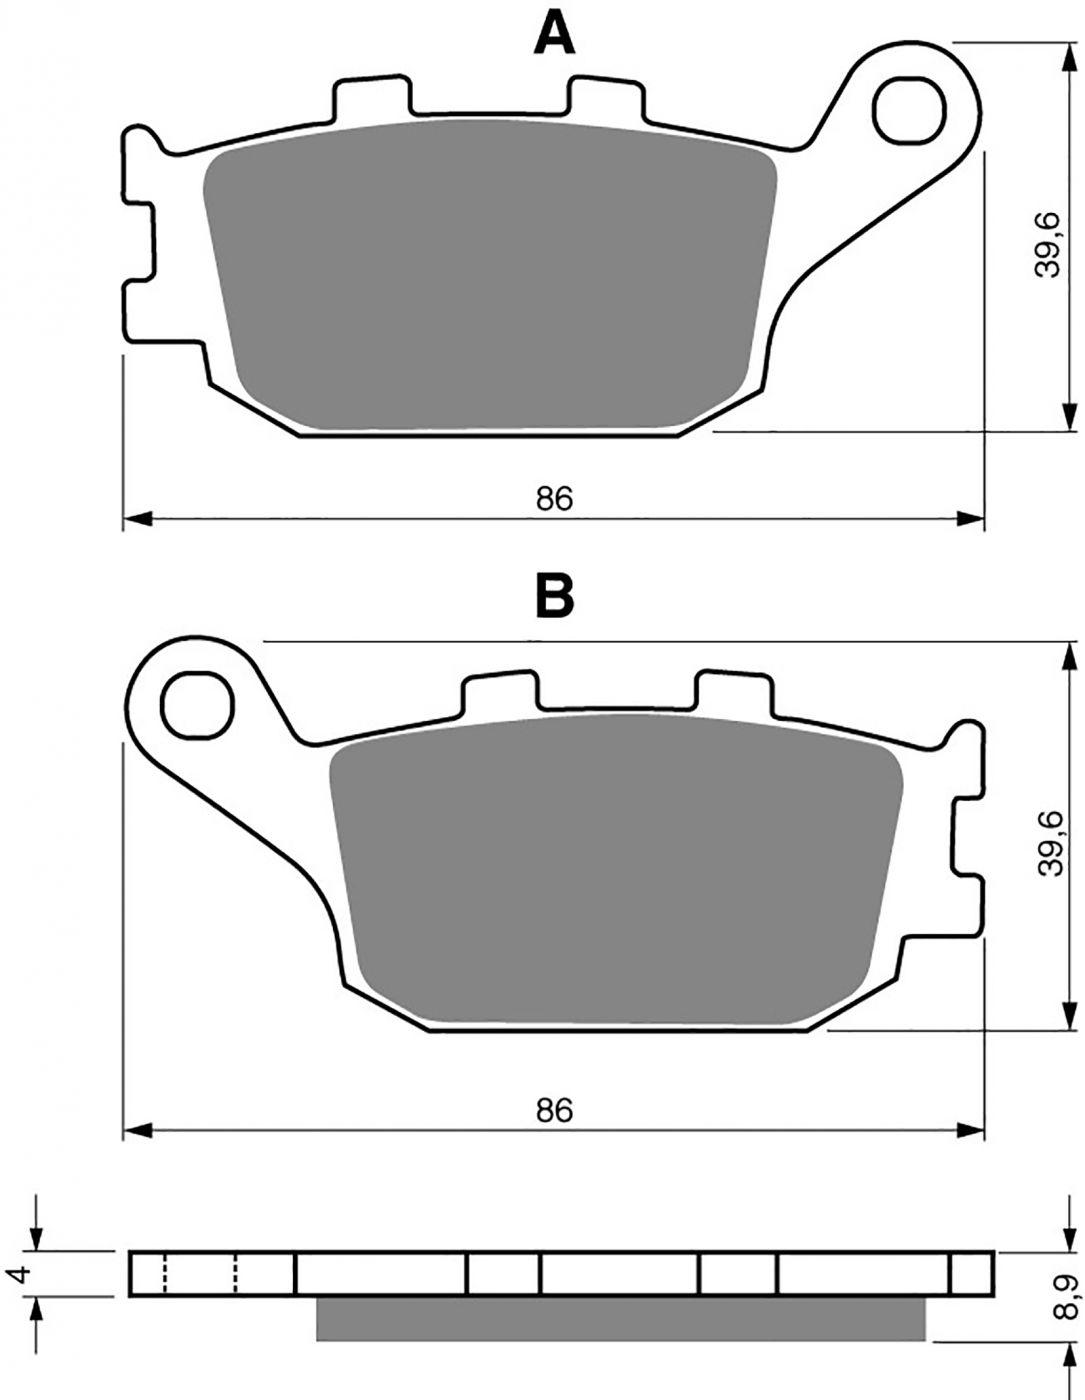 goldfren s33 brake pads - 700021GS image